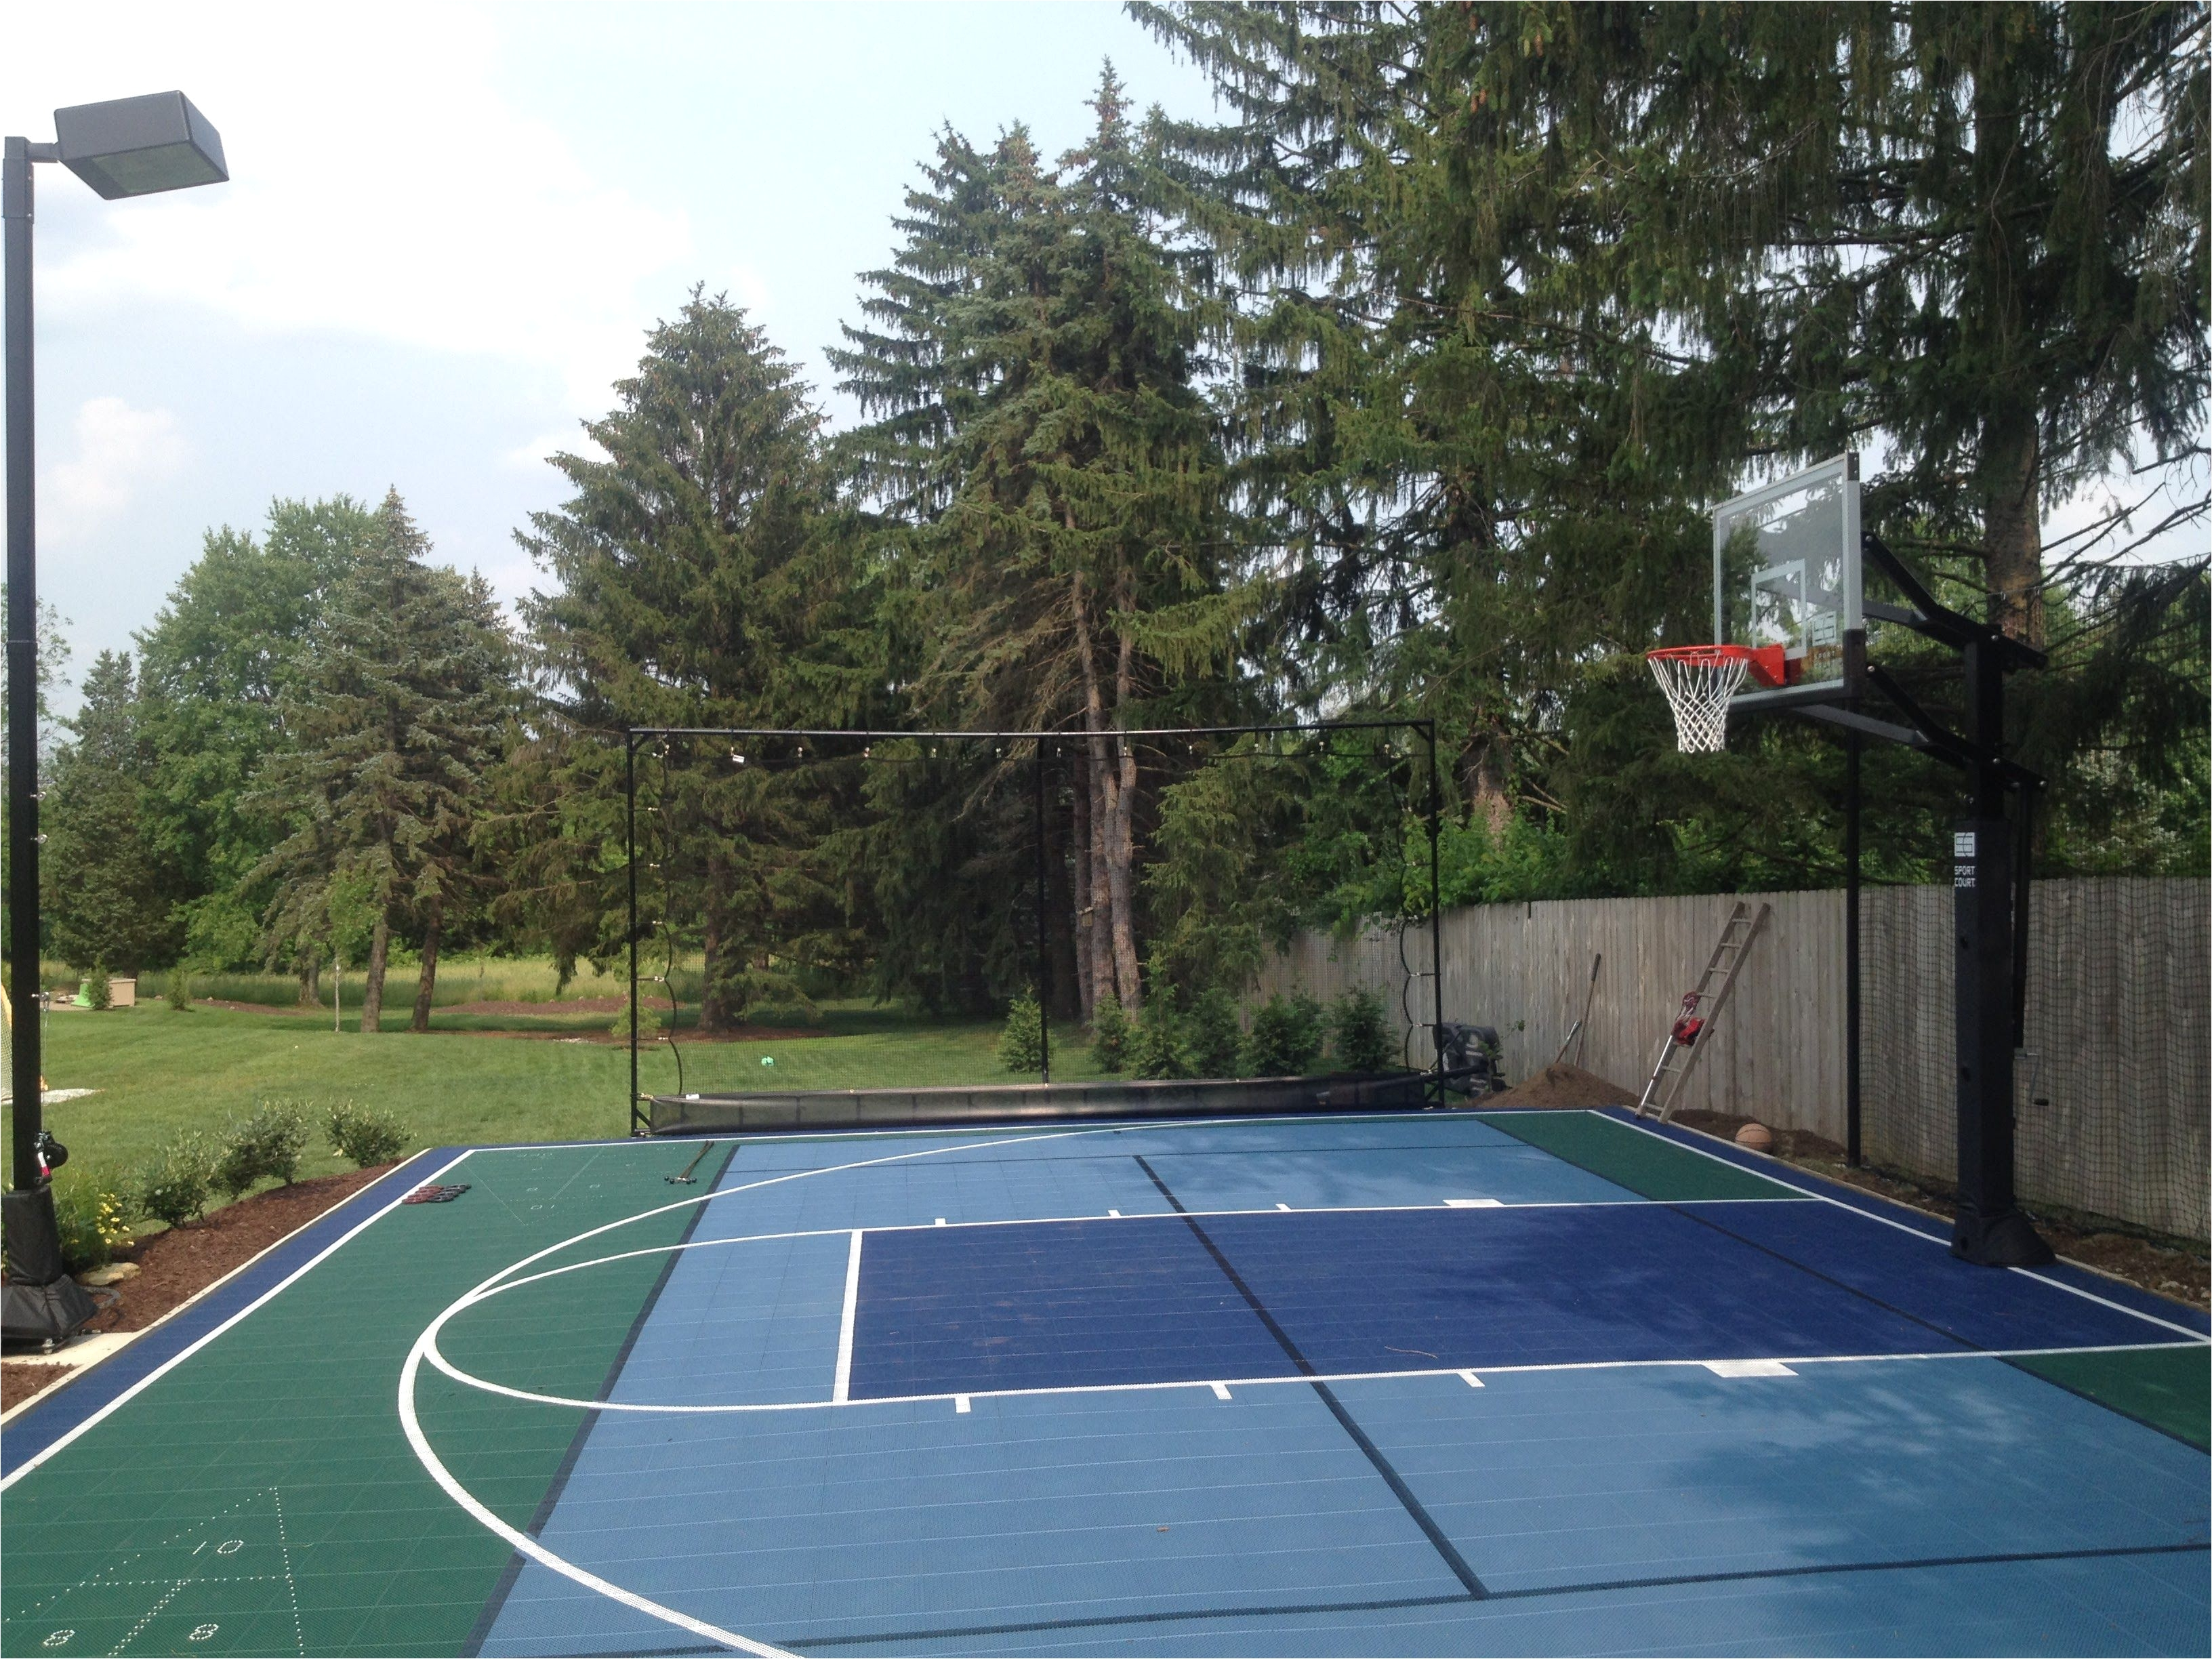 backyard tennis courtbackyard sportsbackyard playbackyard ideasbadmintonplay ideasthe planvolleyballhandball